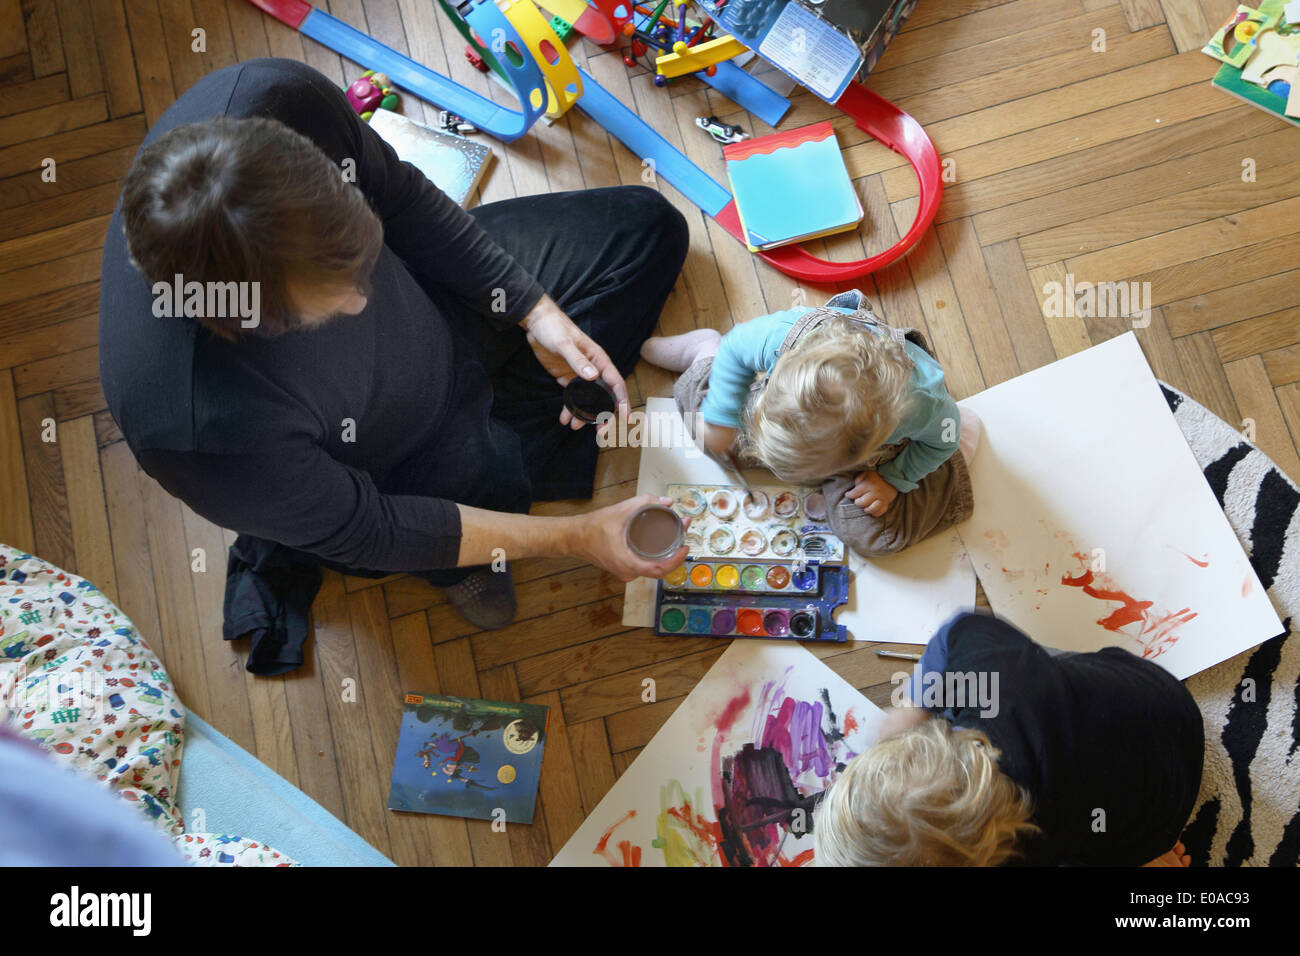 Vater und Söhne Malerei auf Etage Stockbild